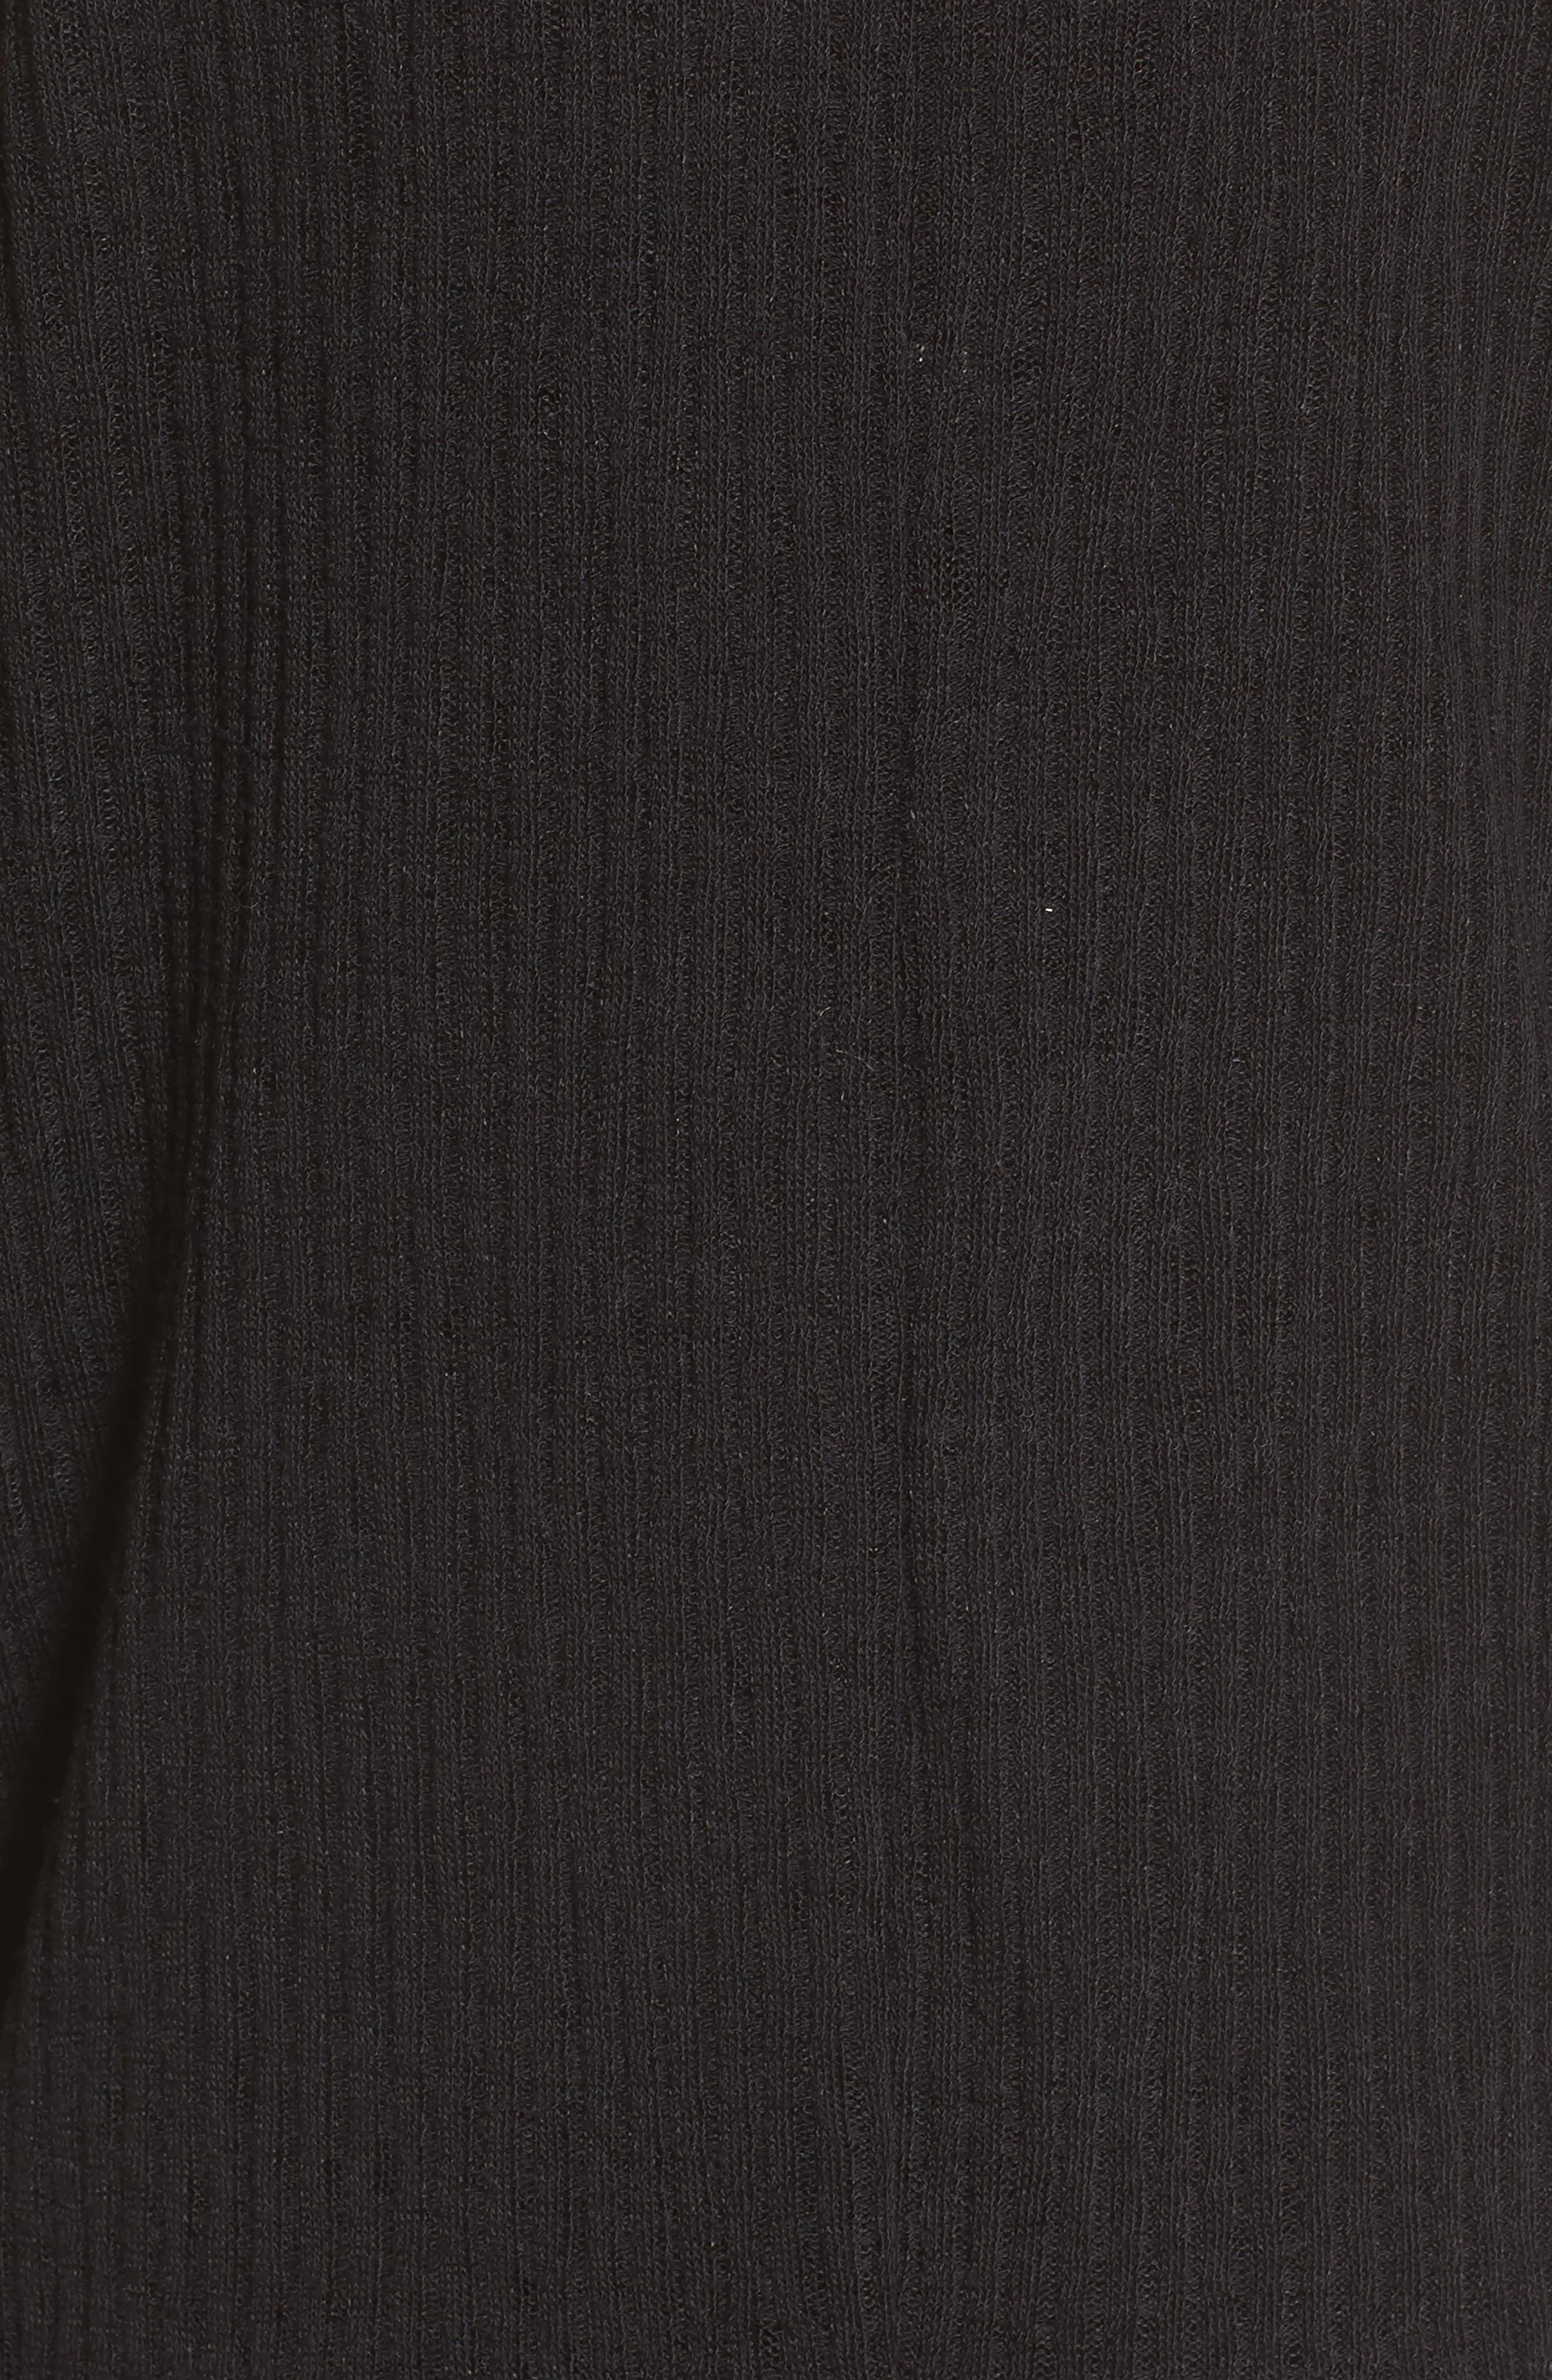 Ribbed Knit Cardigan,                             Alternate thumbnail 9, color,